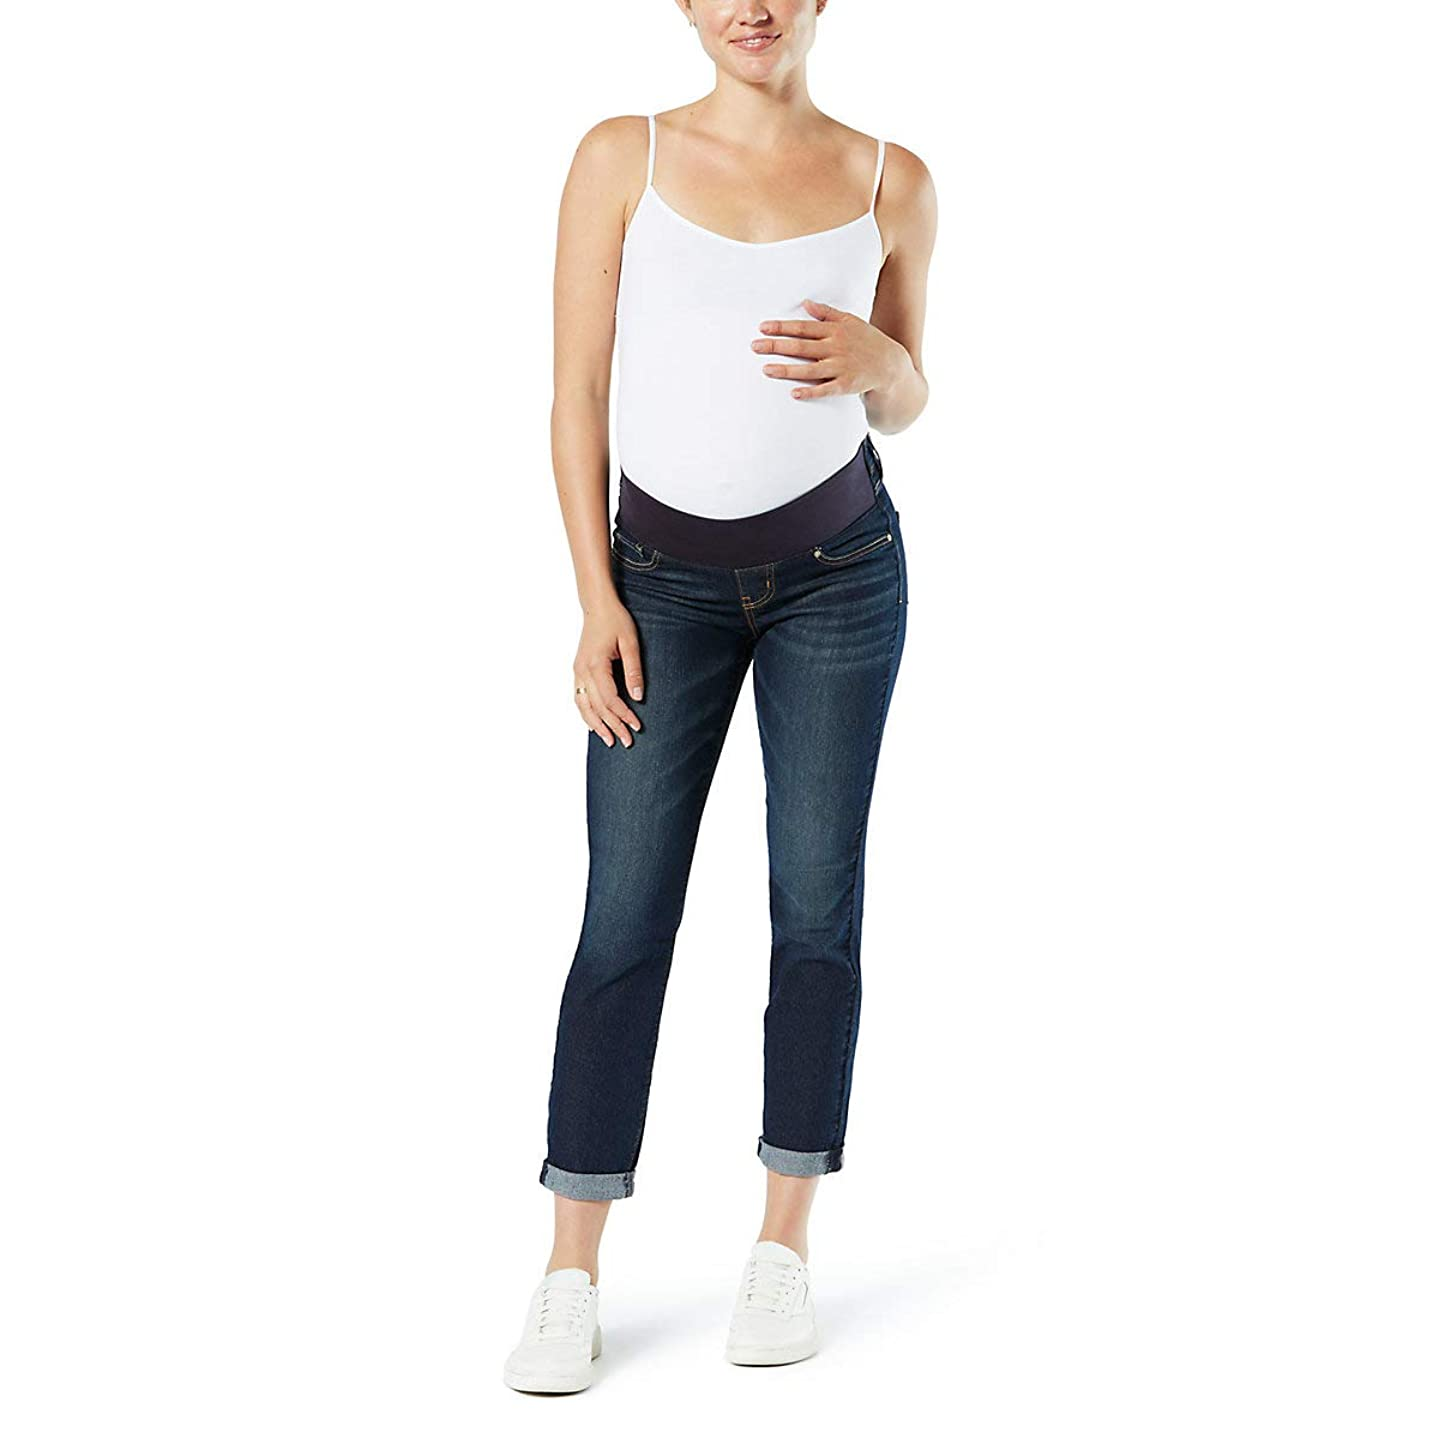 Signature by Levi Strauss & Co. Gold Label Women's Maternity Baby Bump Slim Boyfriend Jeans